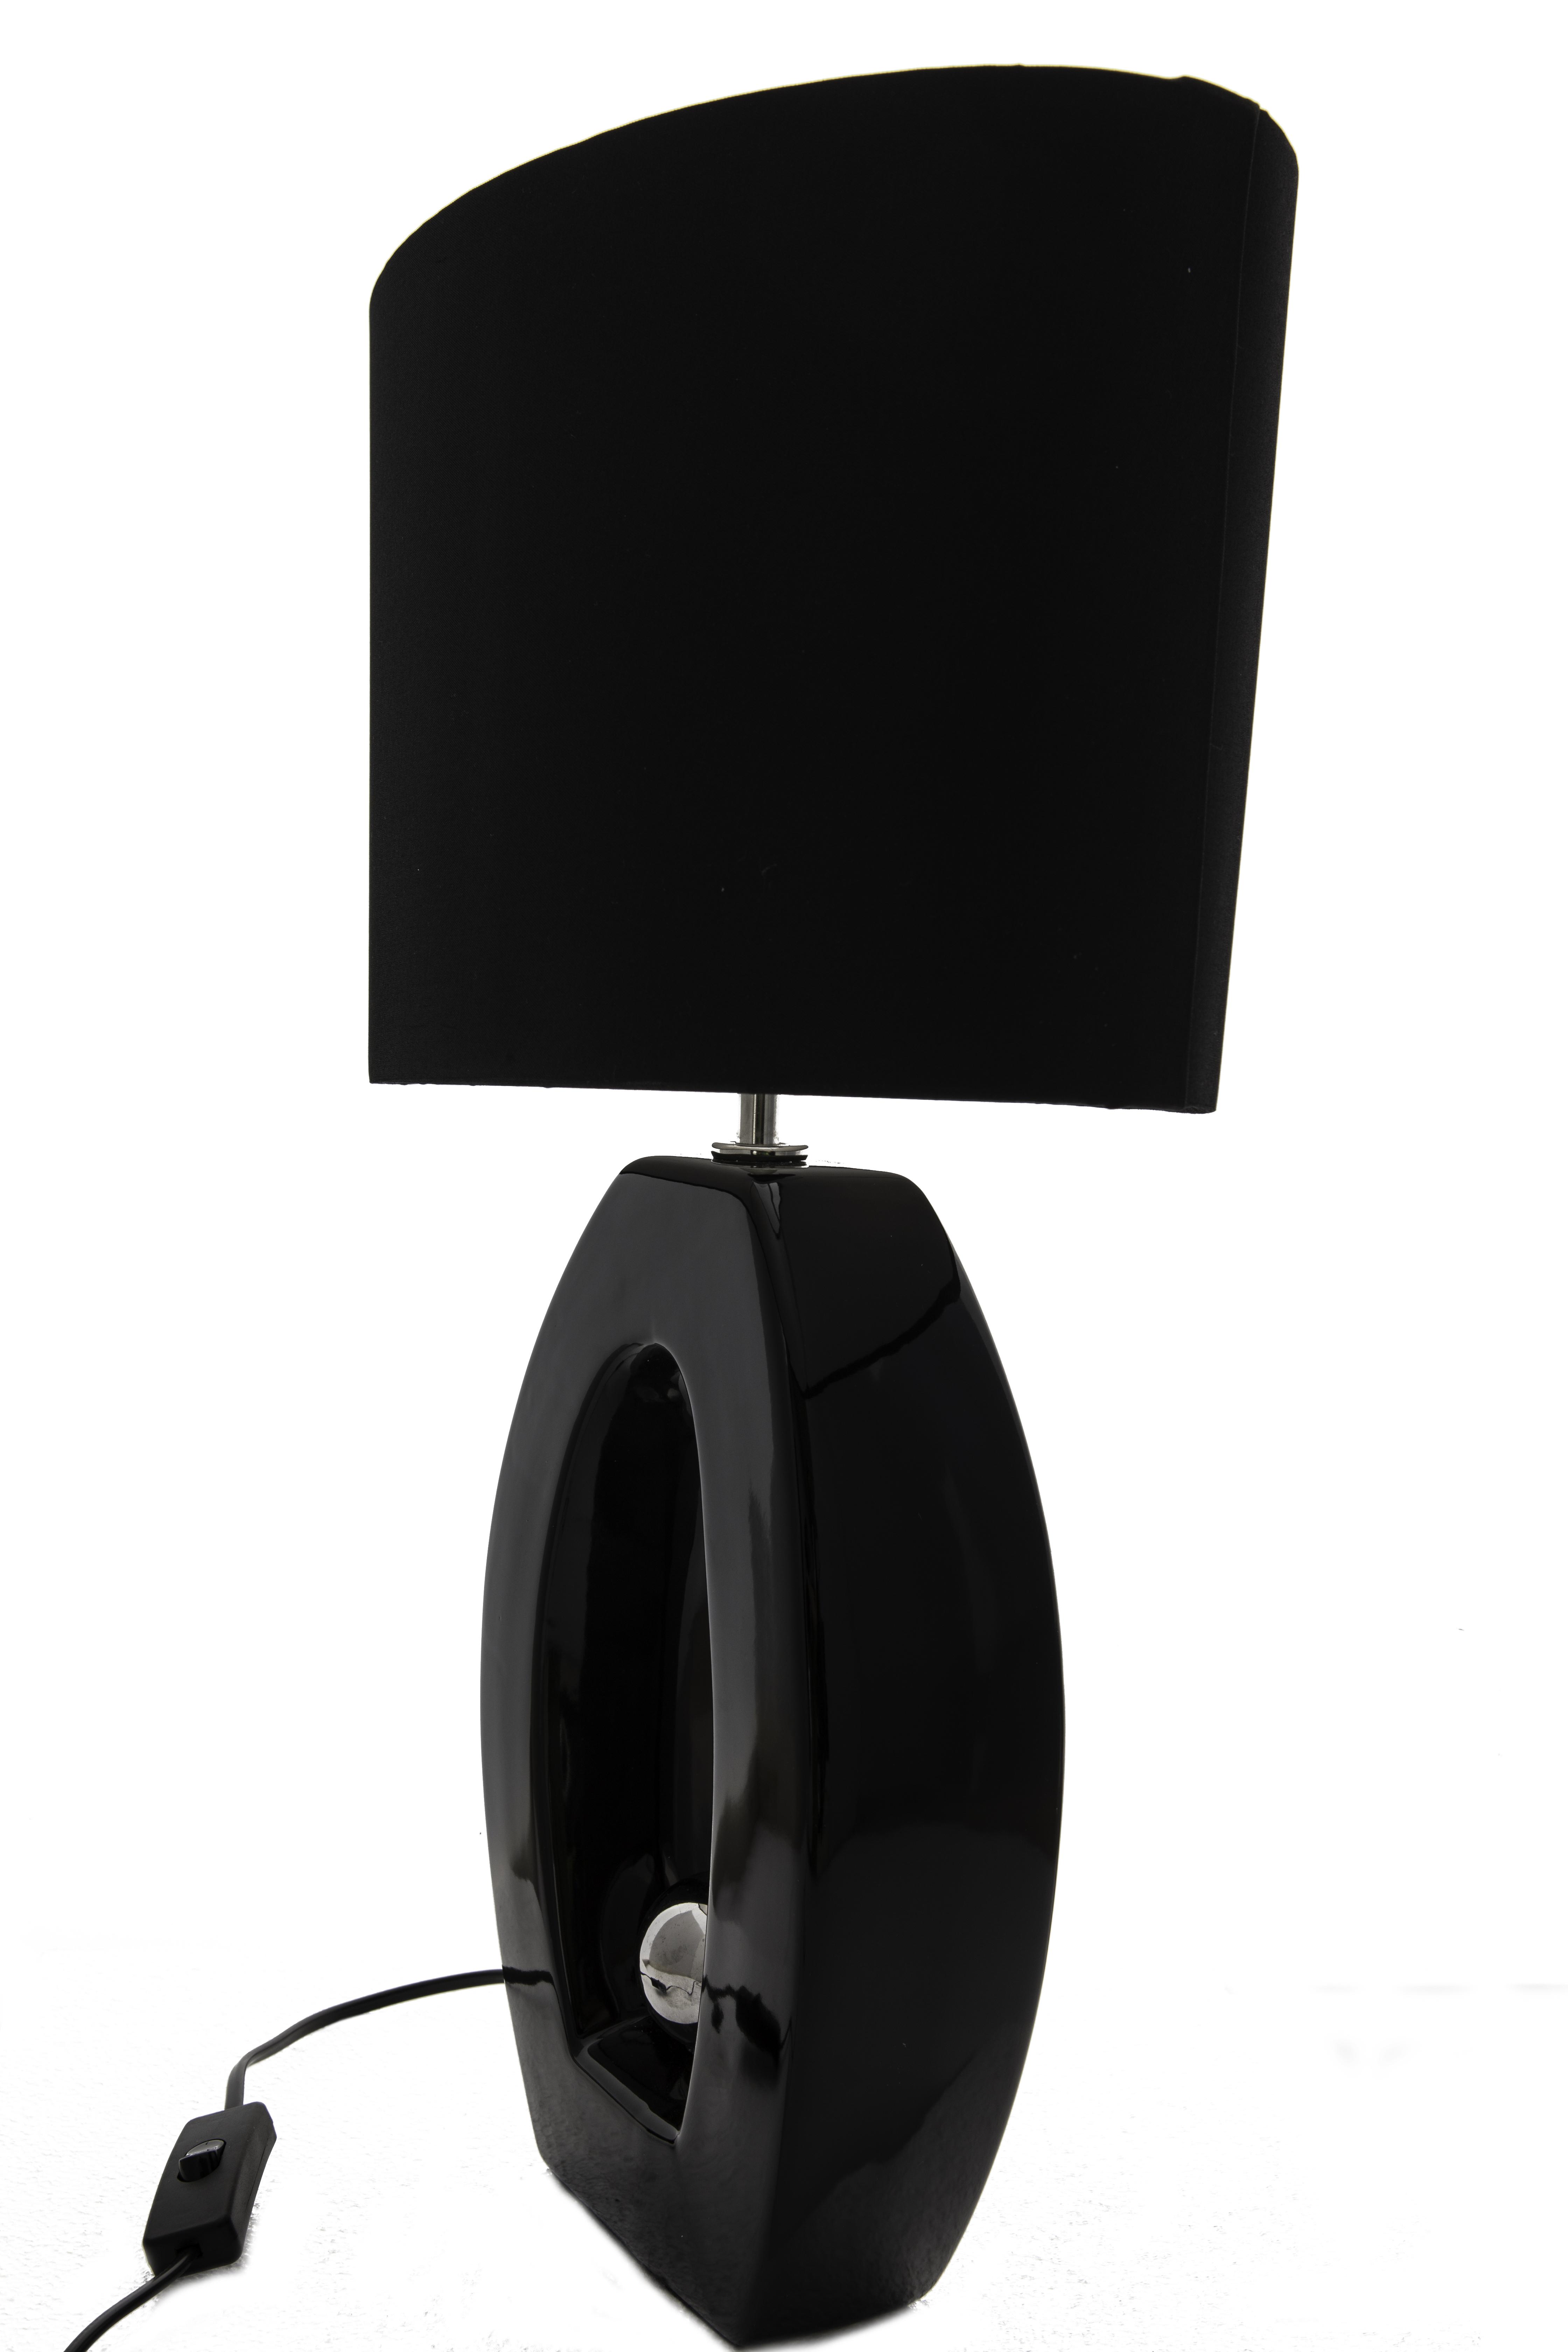 flavius dekorative lampenschirm tischlampe. Black Bedroom Furniture Sets. Home Design Ideas